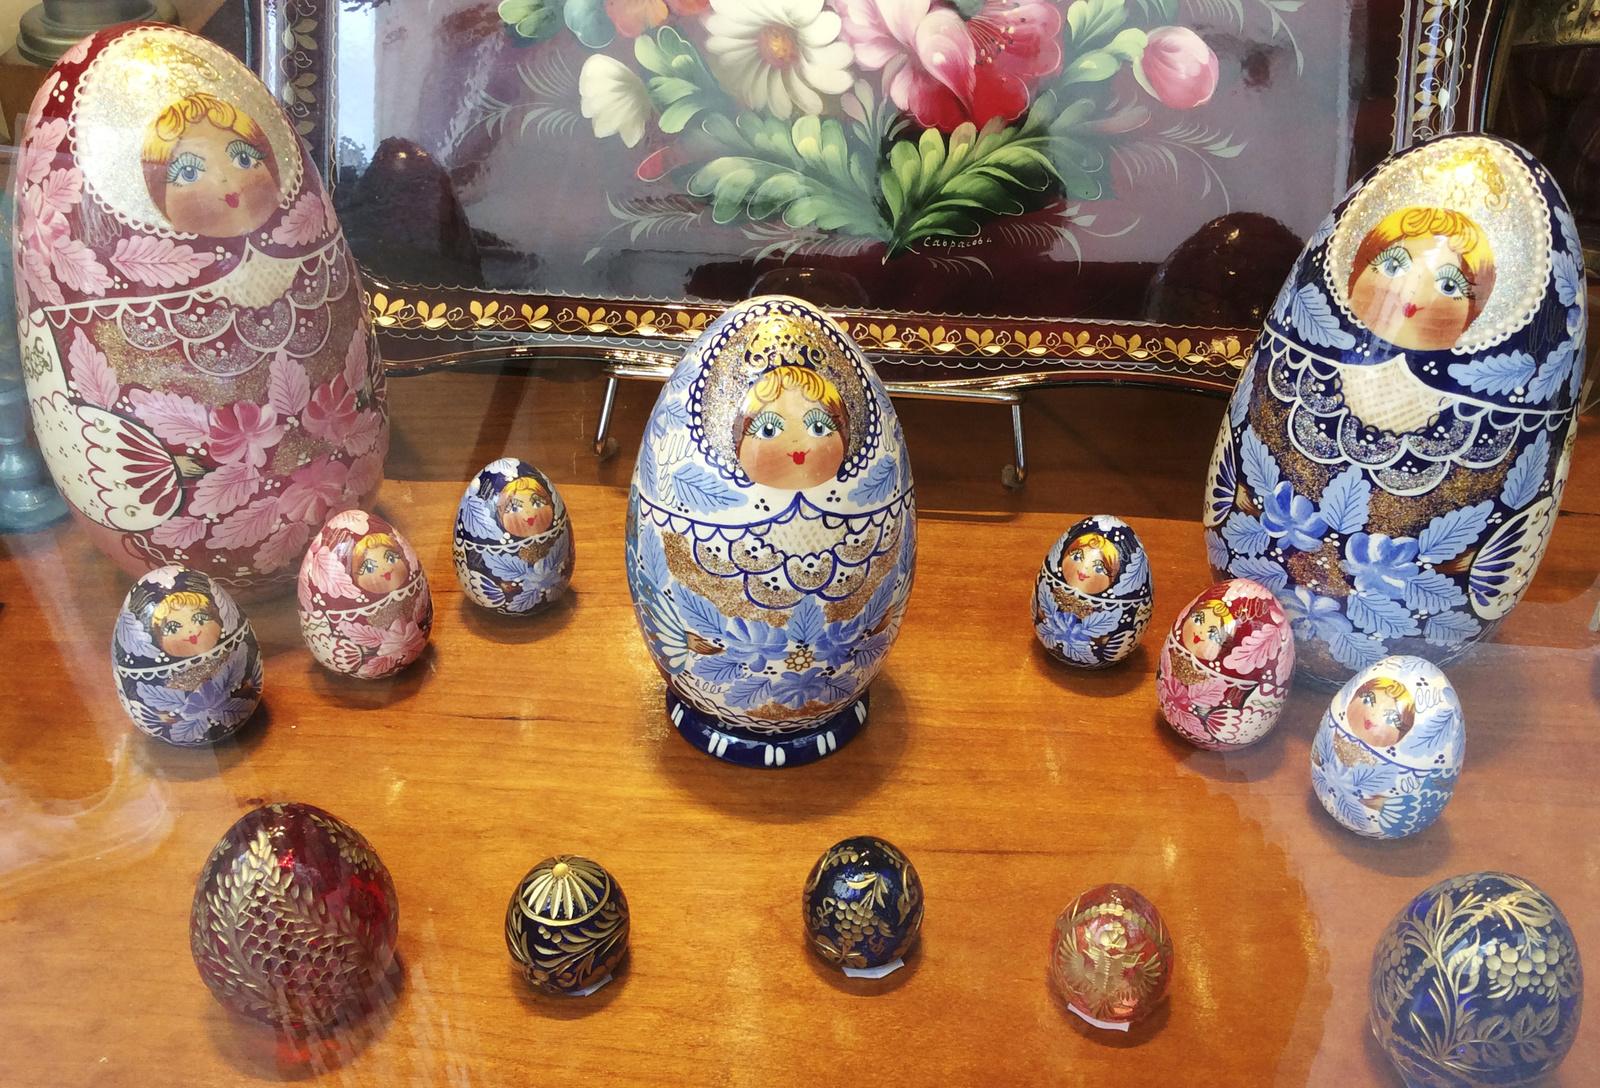 Pâques J-6 / Découverte : des &quot&#x3B;matriochka&quot&#x3B; en forme d'oeuf...